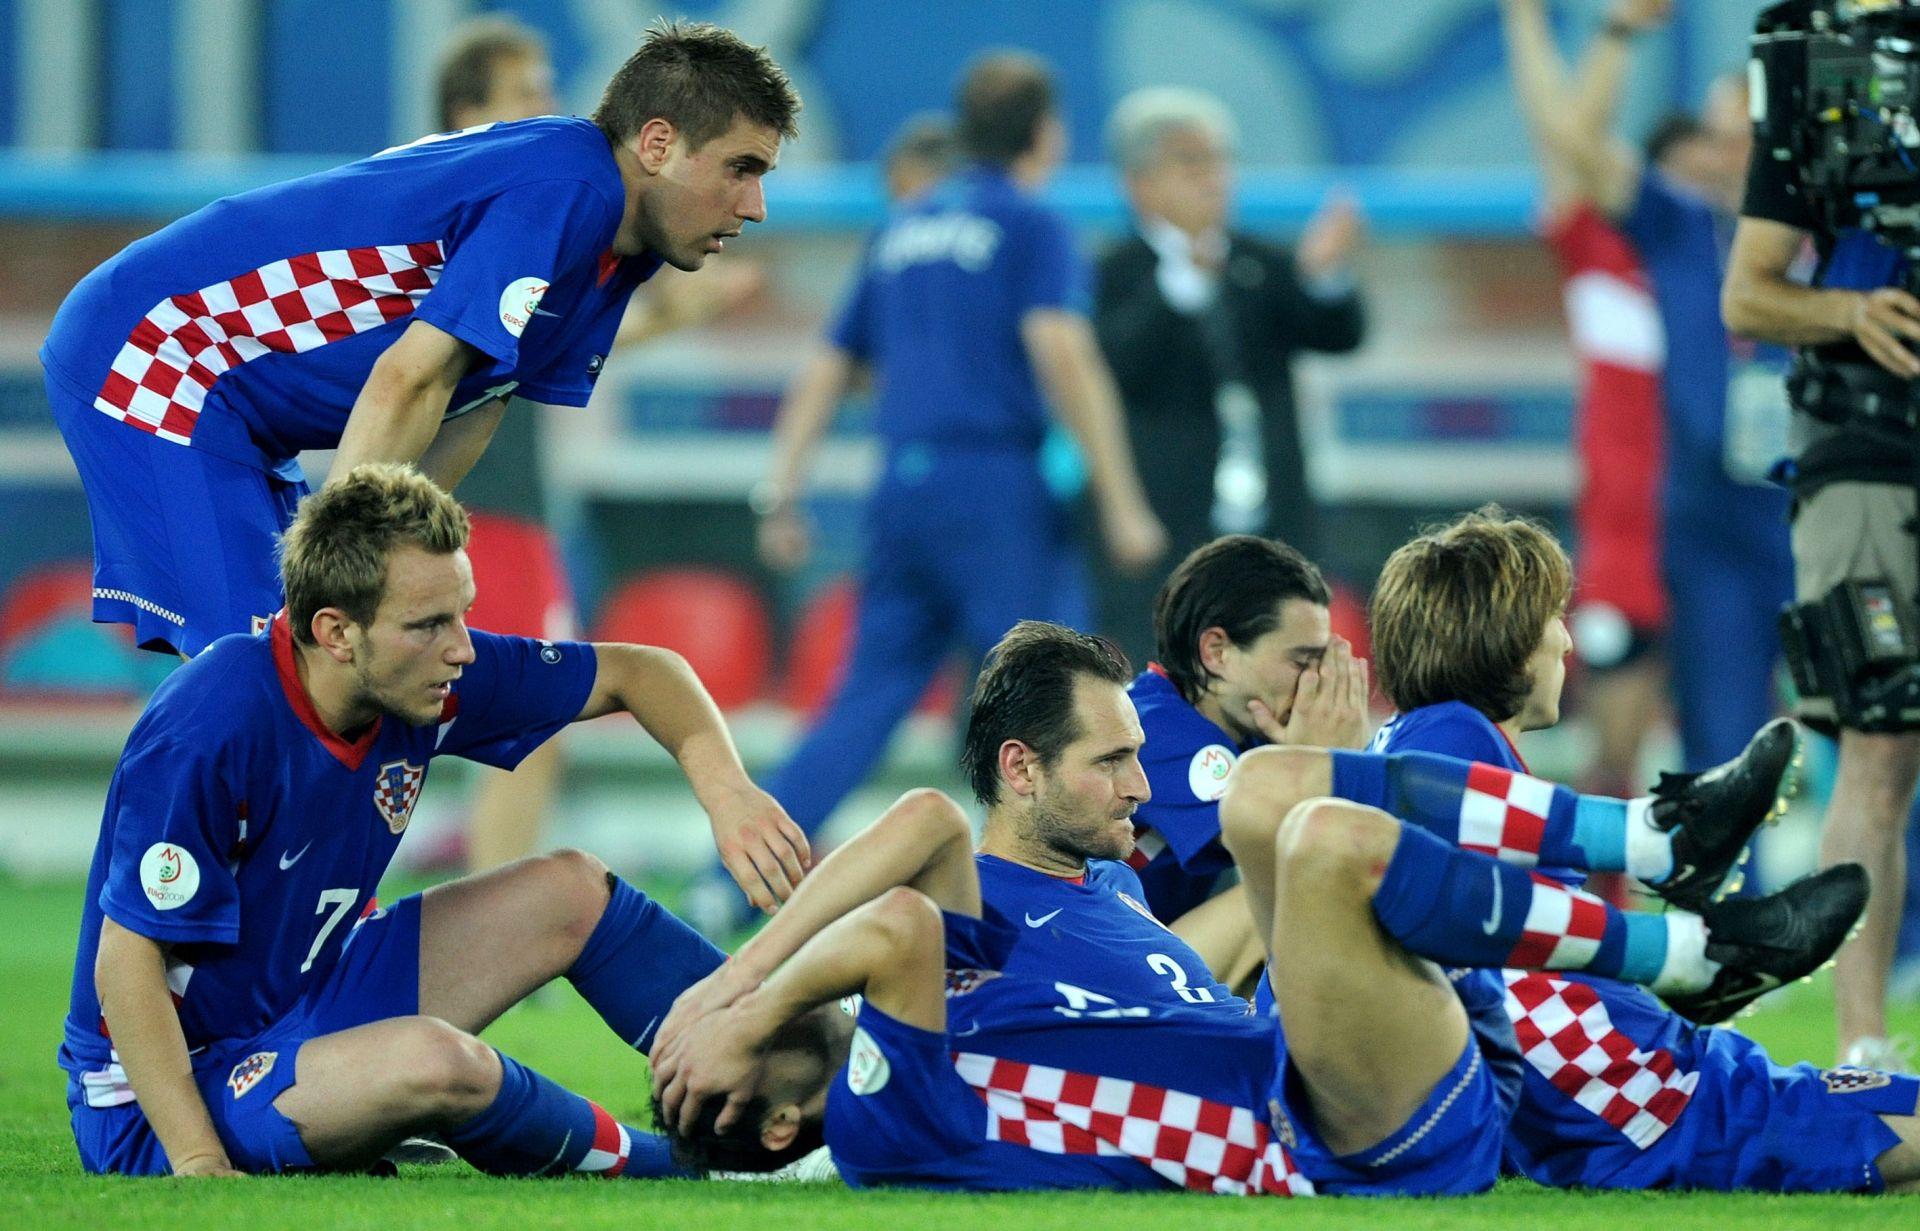 JOŠ BOLI PORAZ IZ BEČA Dosadašnje utakmice Hrvatske protiv Češke, Španjolske i Turske